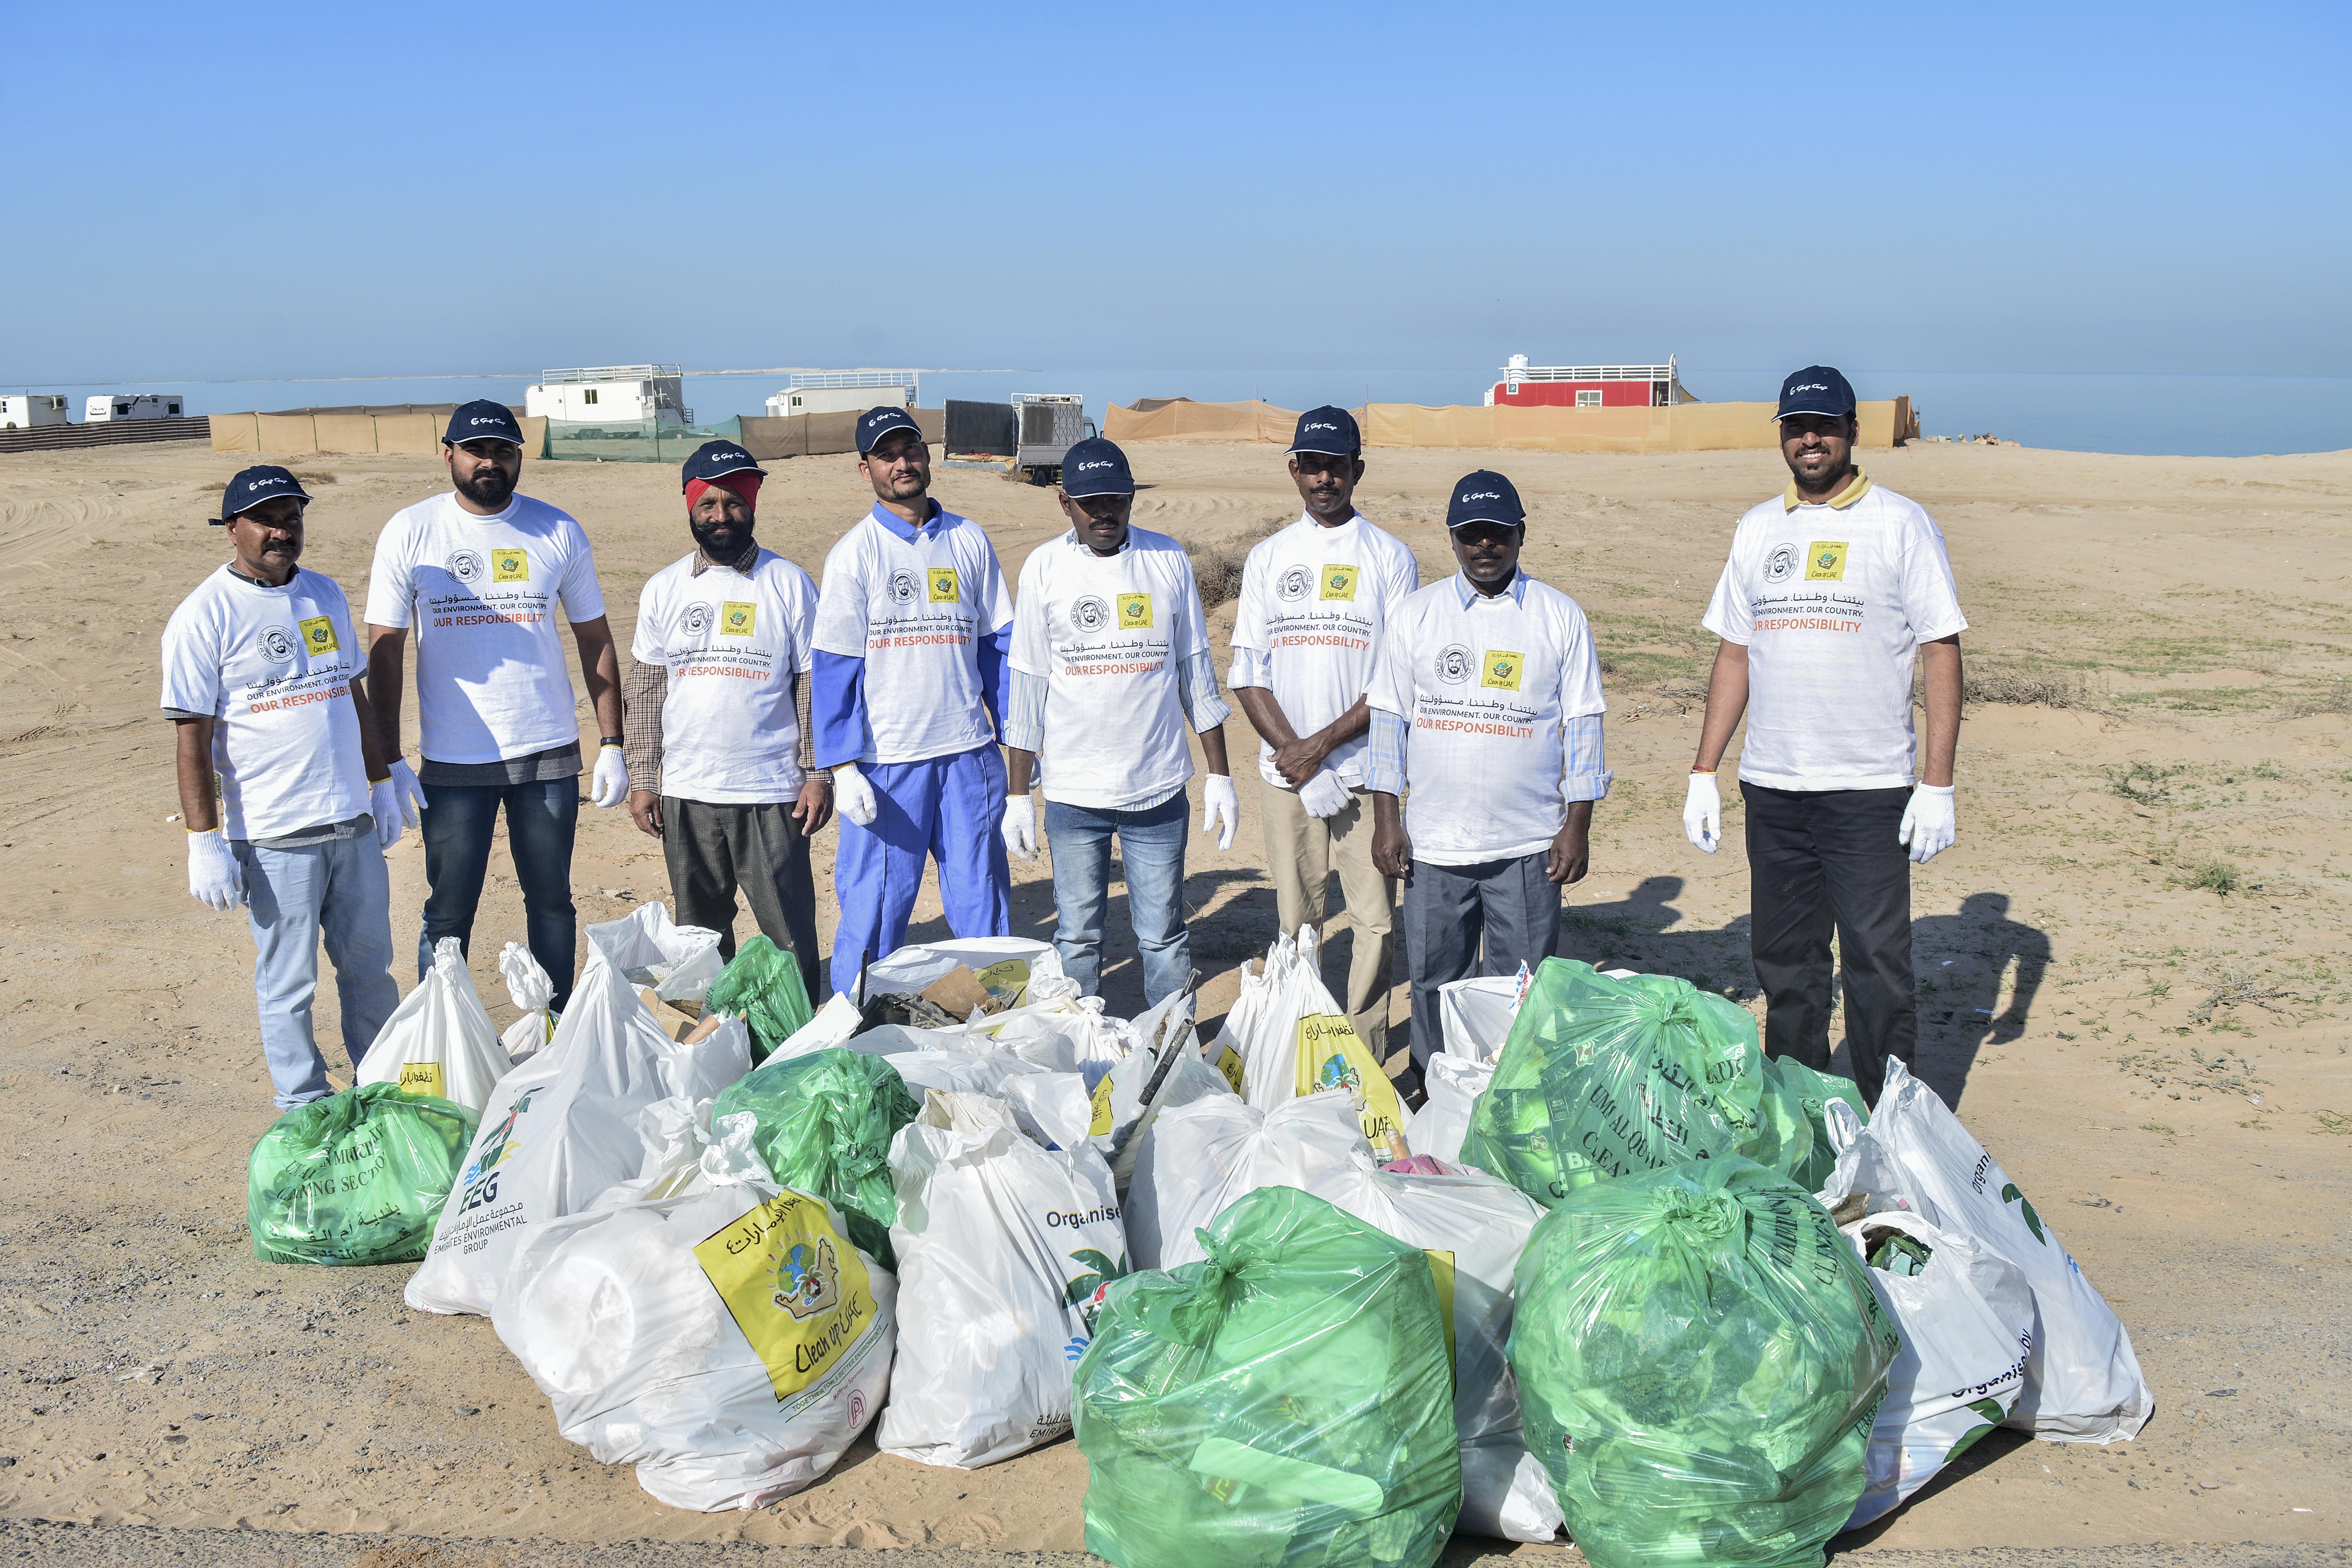 Gulf Craft at Clean UP UAE 2018 (16).jpg